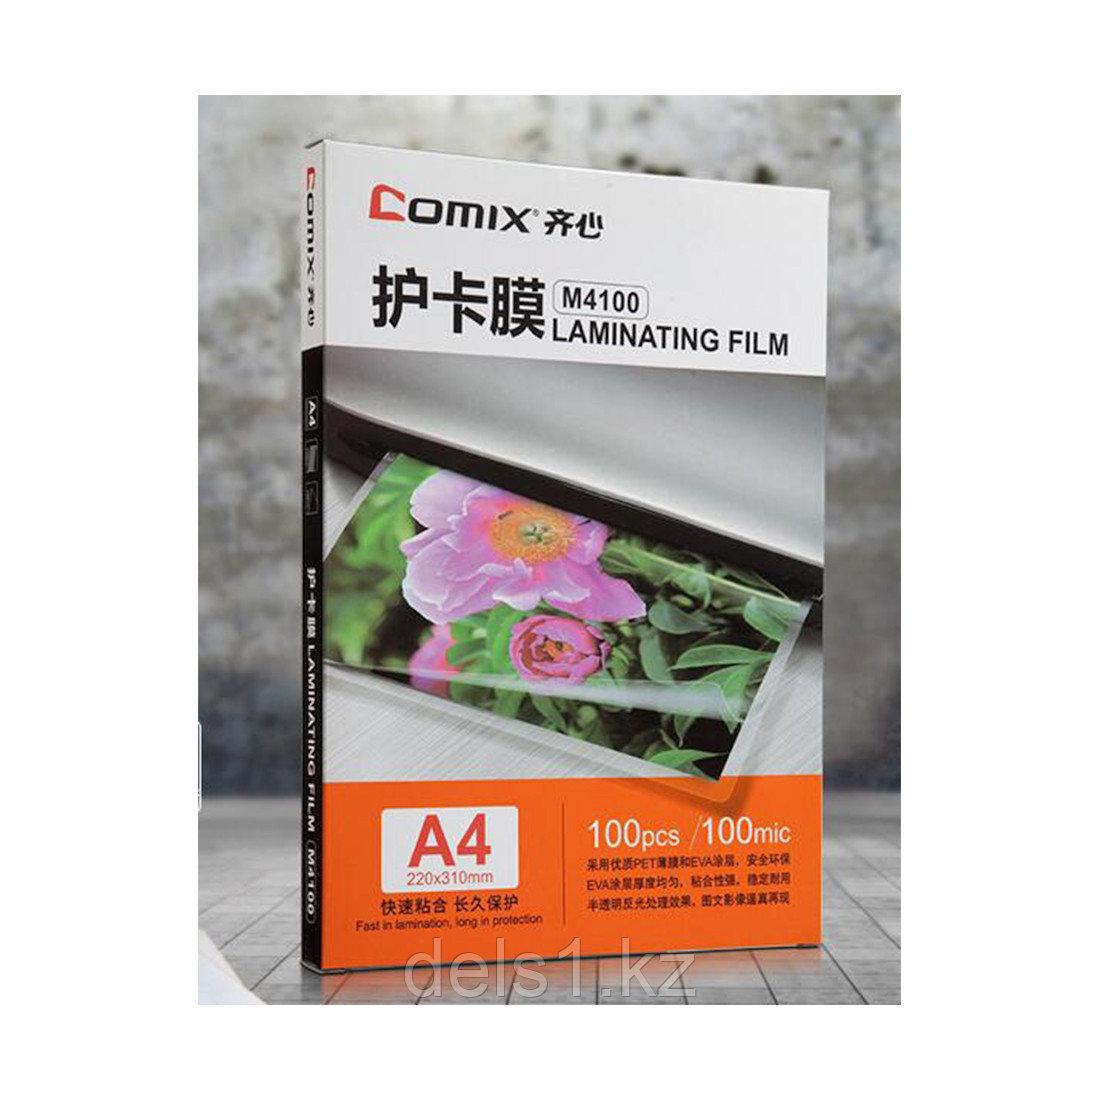 Плёнка для ламинирования COMIX M4100 А4, 100мкм, 100шт.